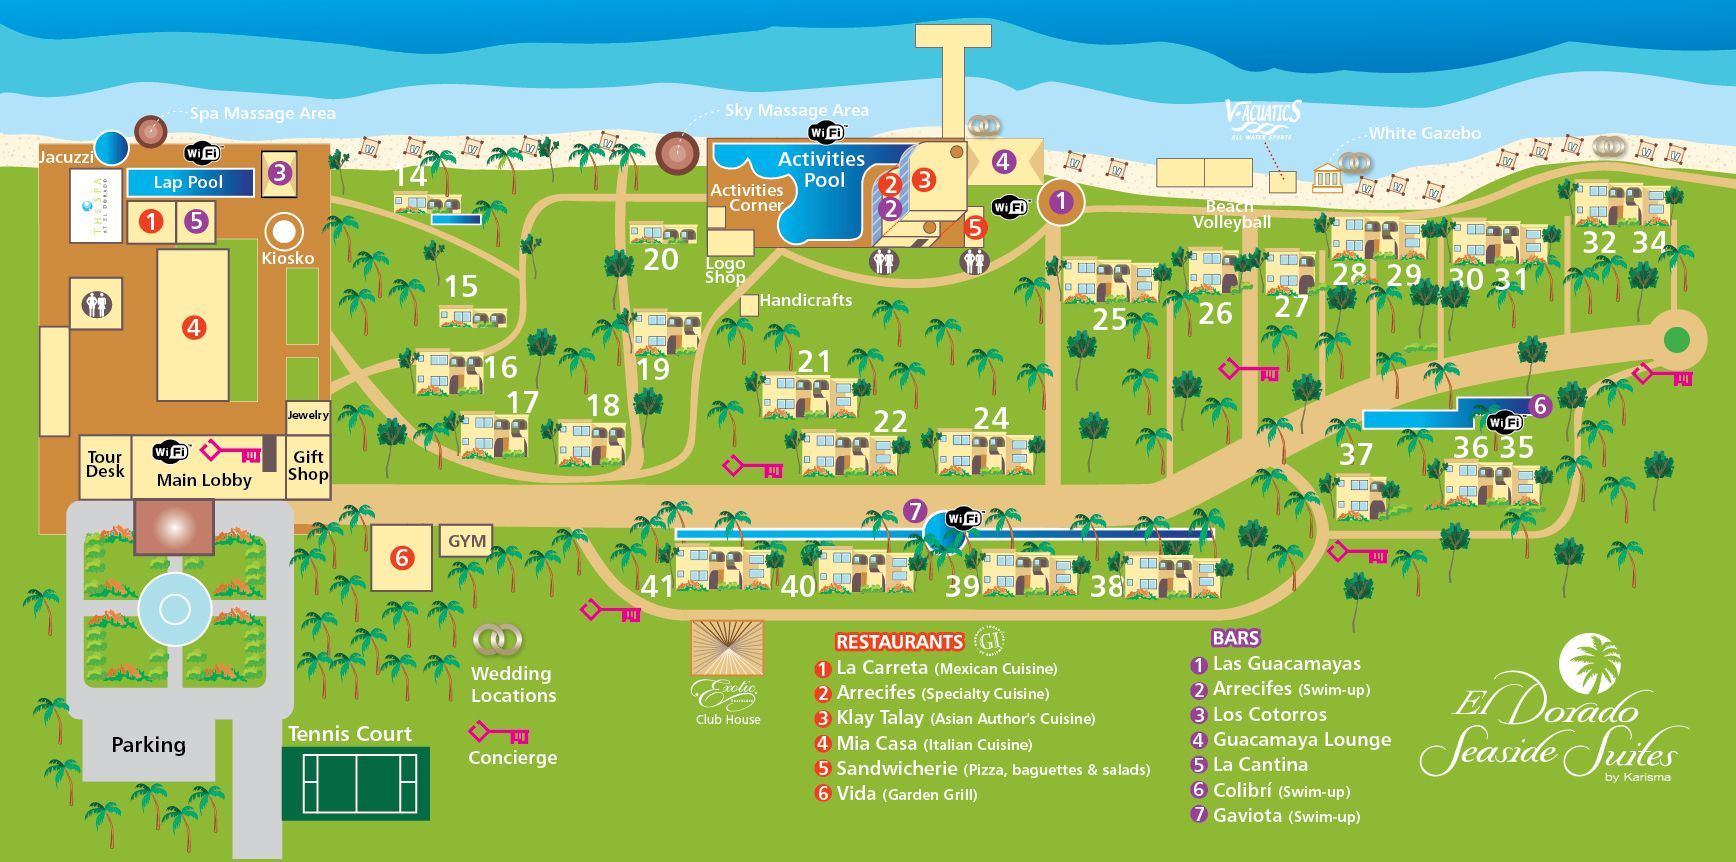 Riviera maya all inclusive resorts and spas those in for Find all inclusive resorts